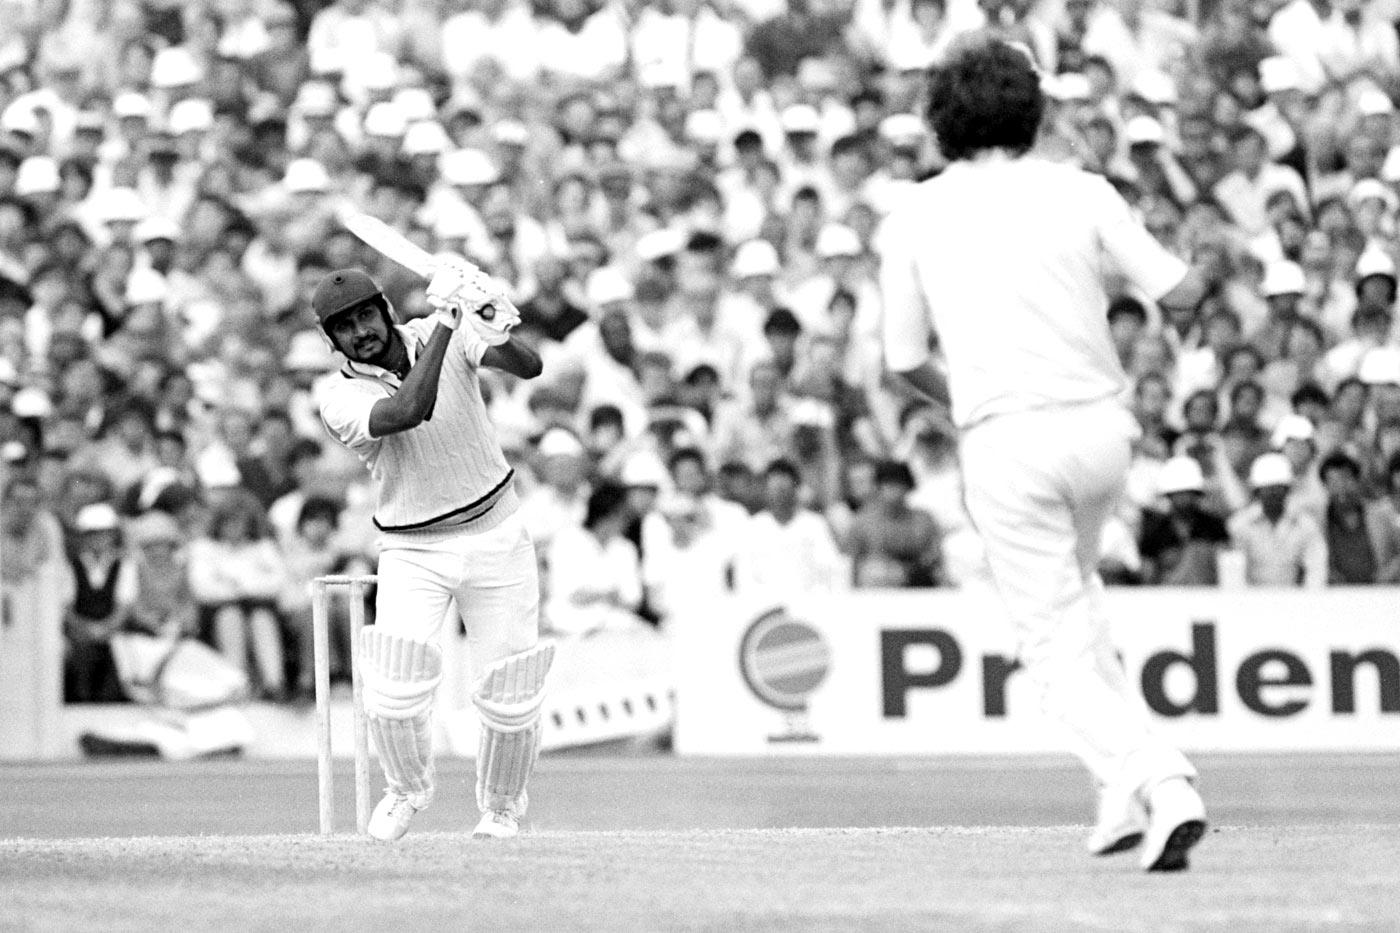 Blogs: Samir Chopra: Sandeep Patil, the Bombay Hammer   Cricket ... for Sandeep Patil 1983  56bof